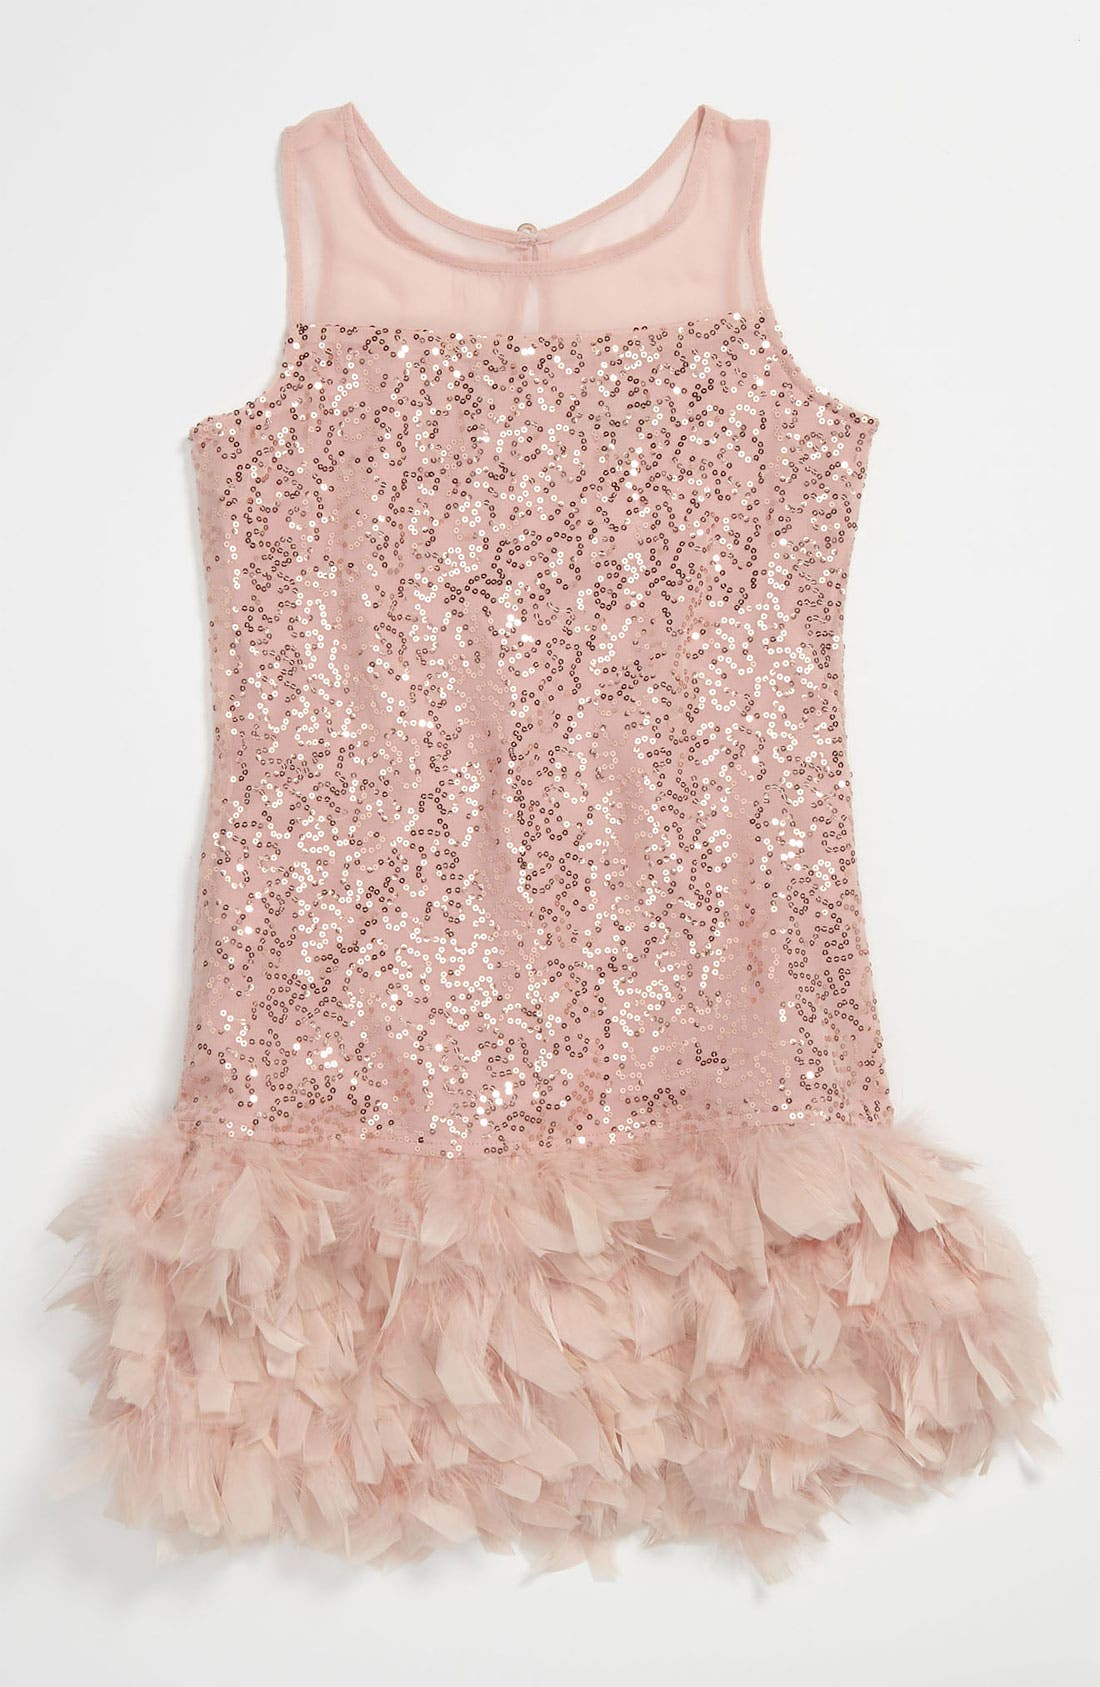 Alternate Image 1 Selected - Elisa B 'Fancy Feather' Dress (Big Girls)